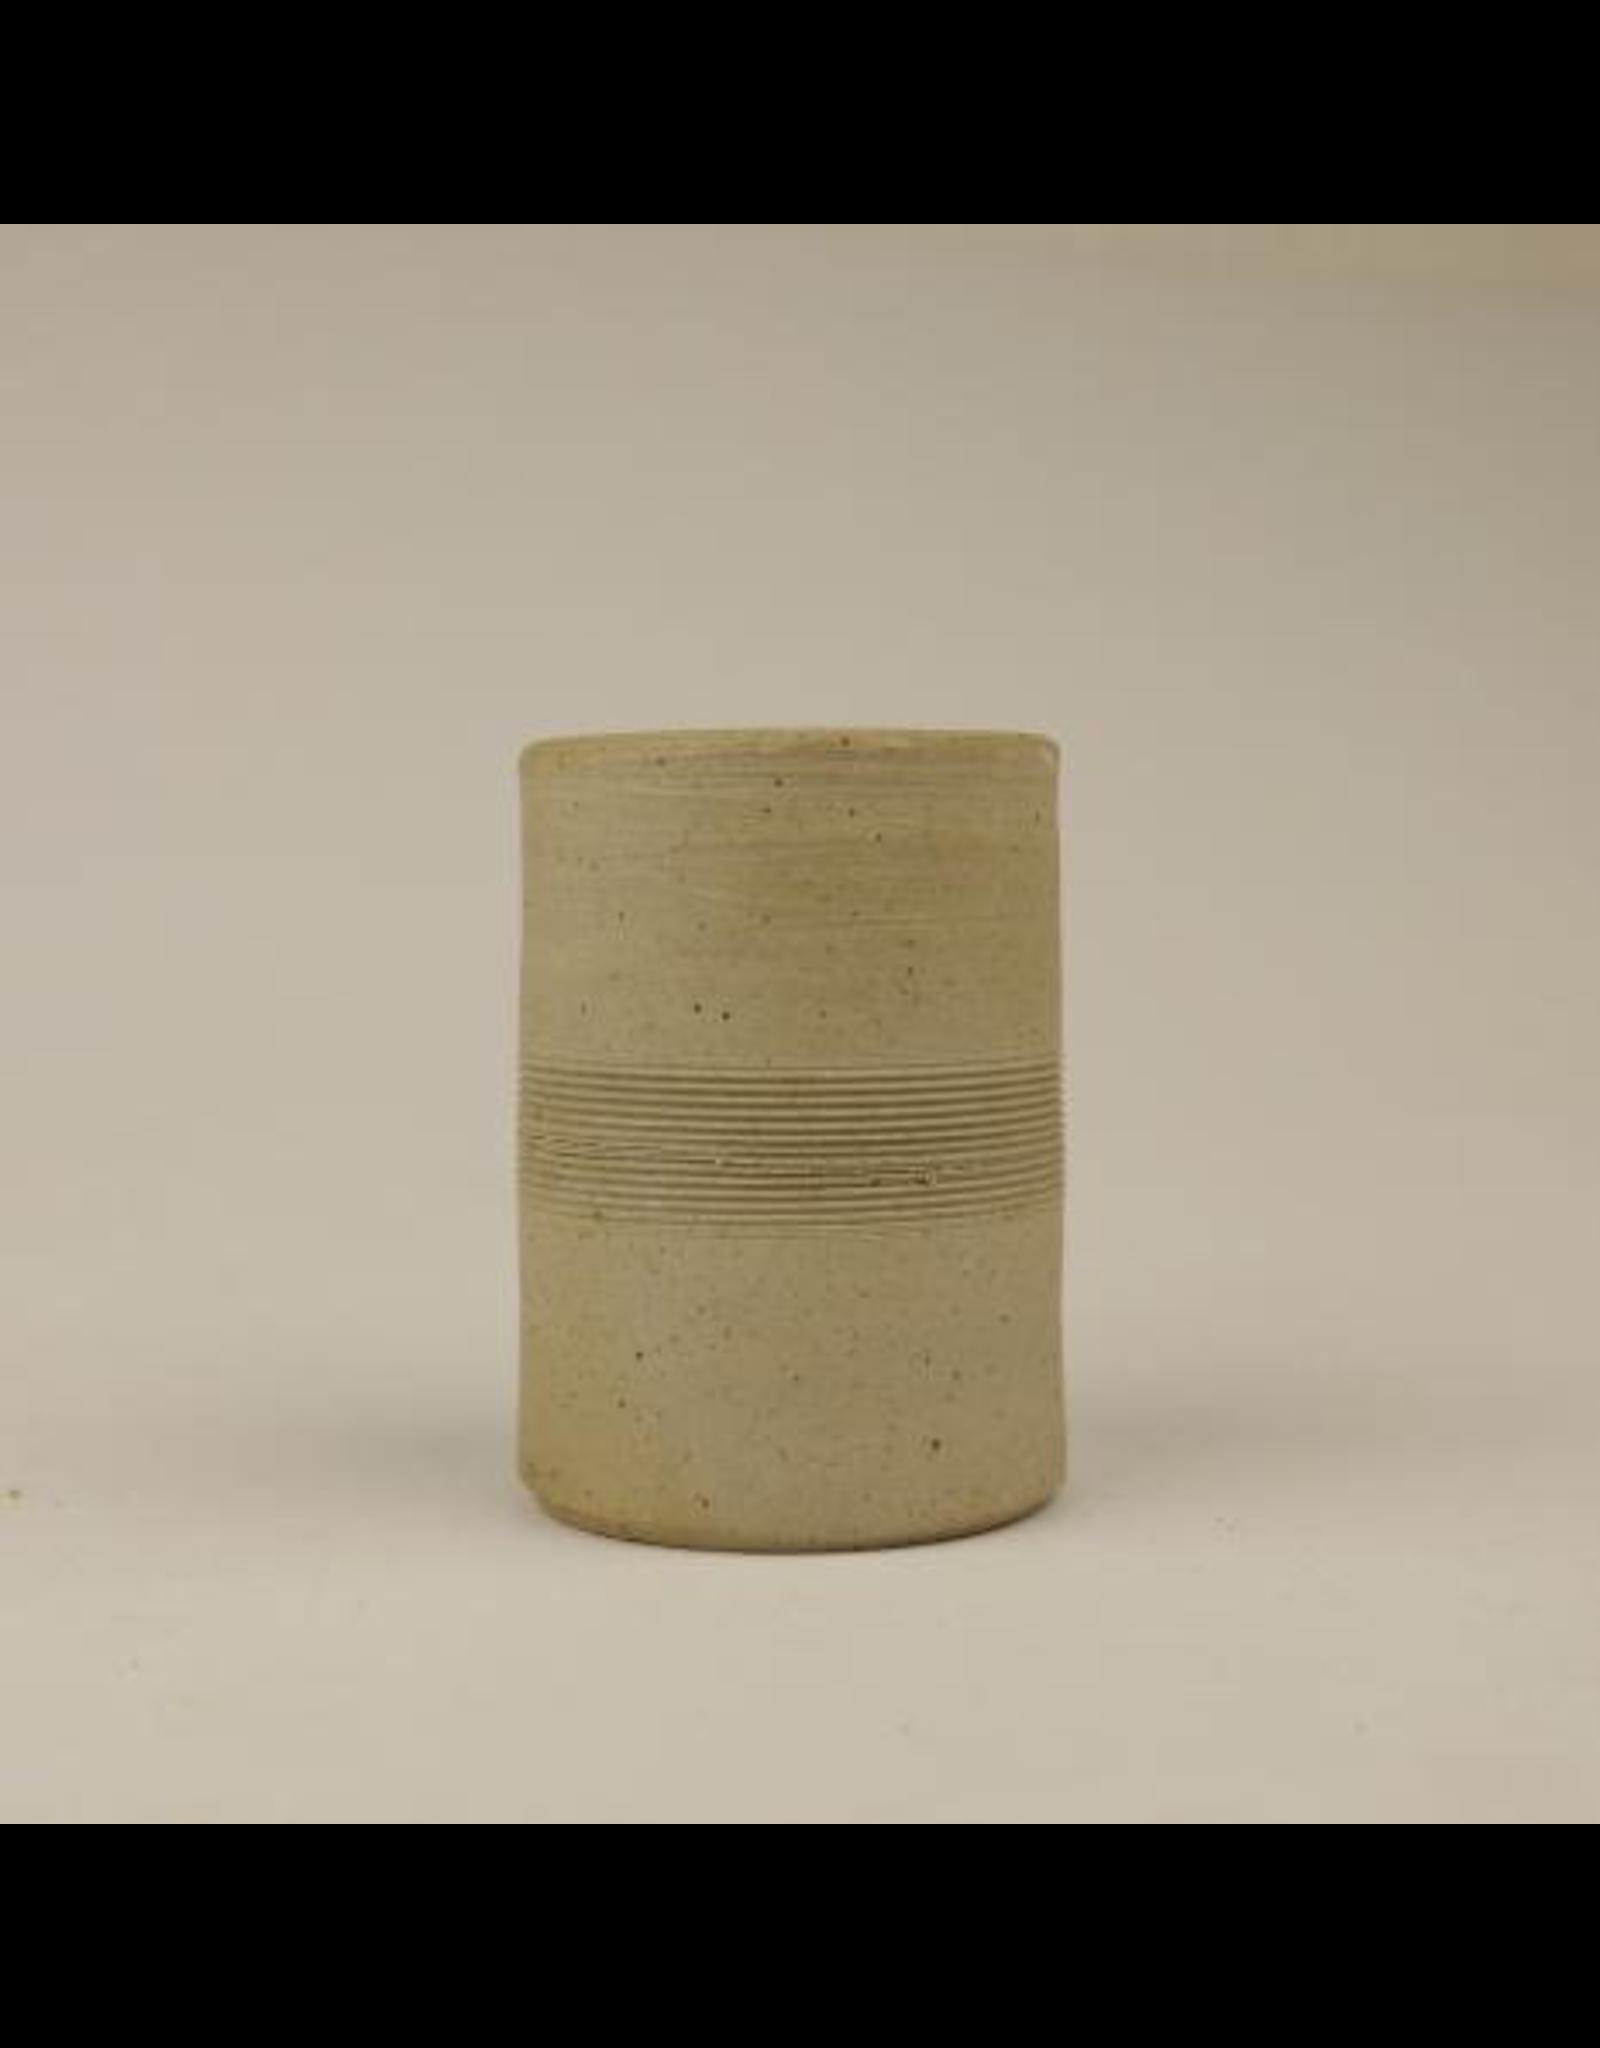 Potclays Draycott White Stoneware